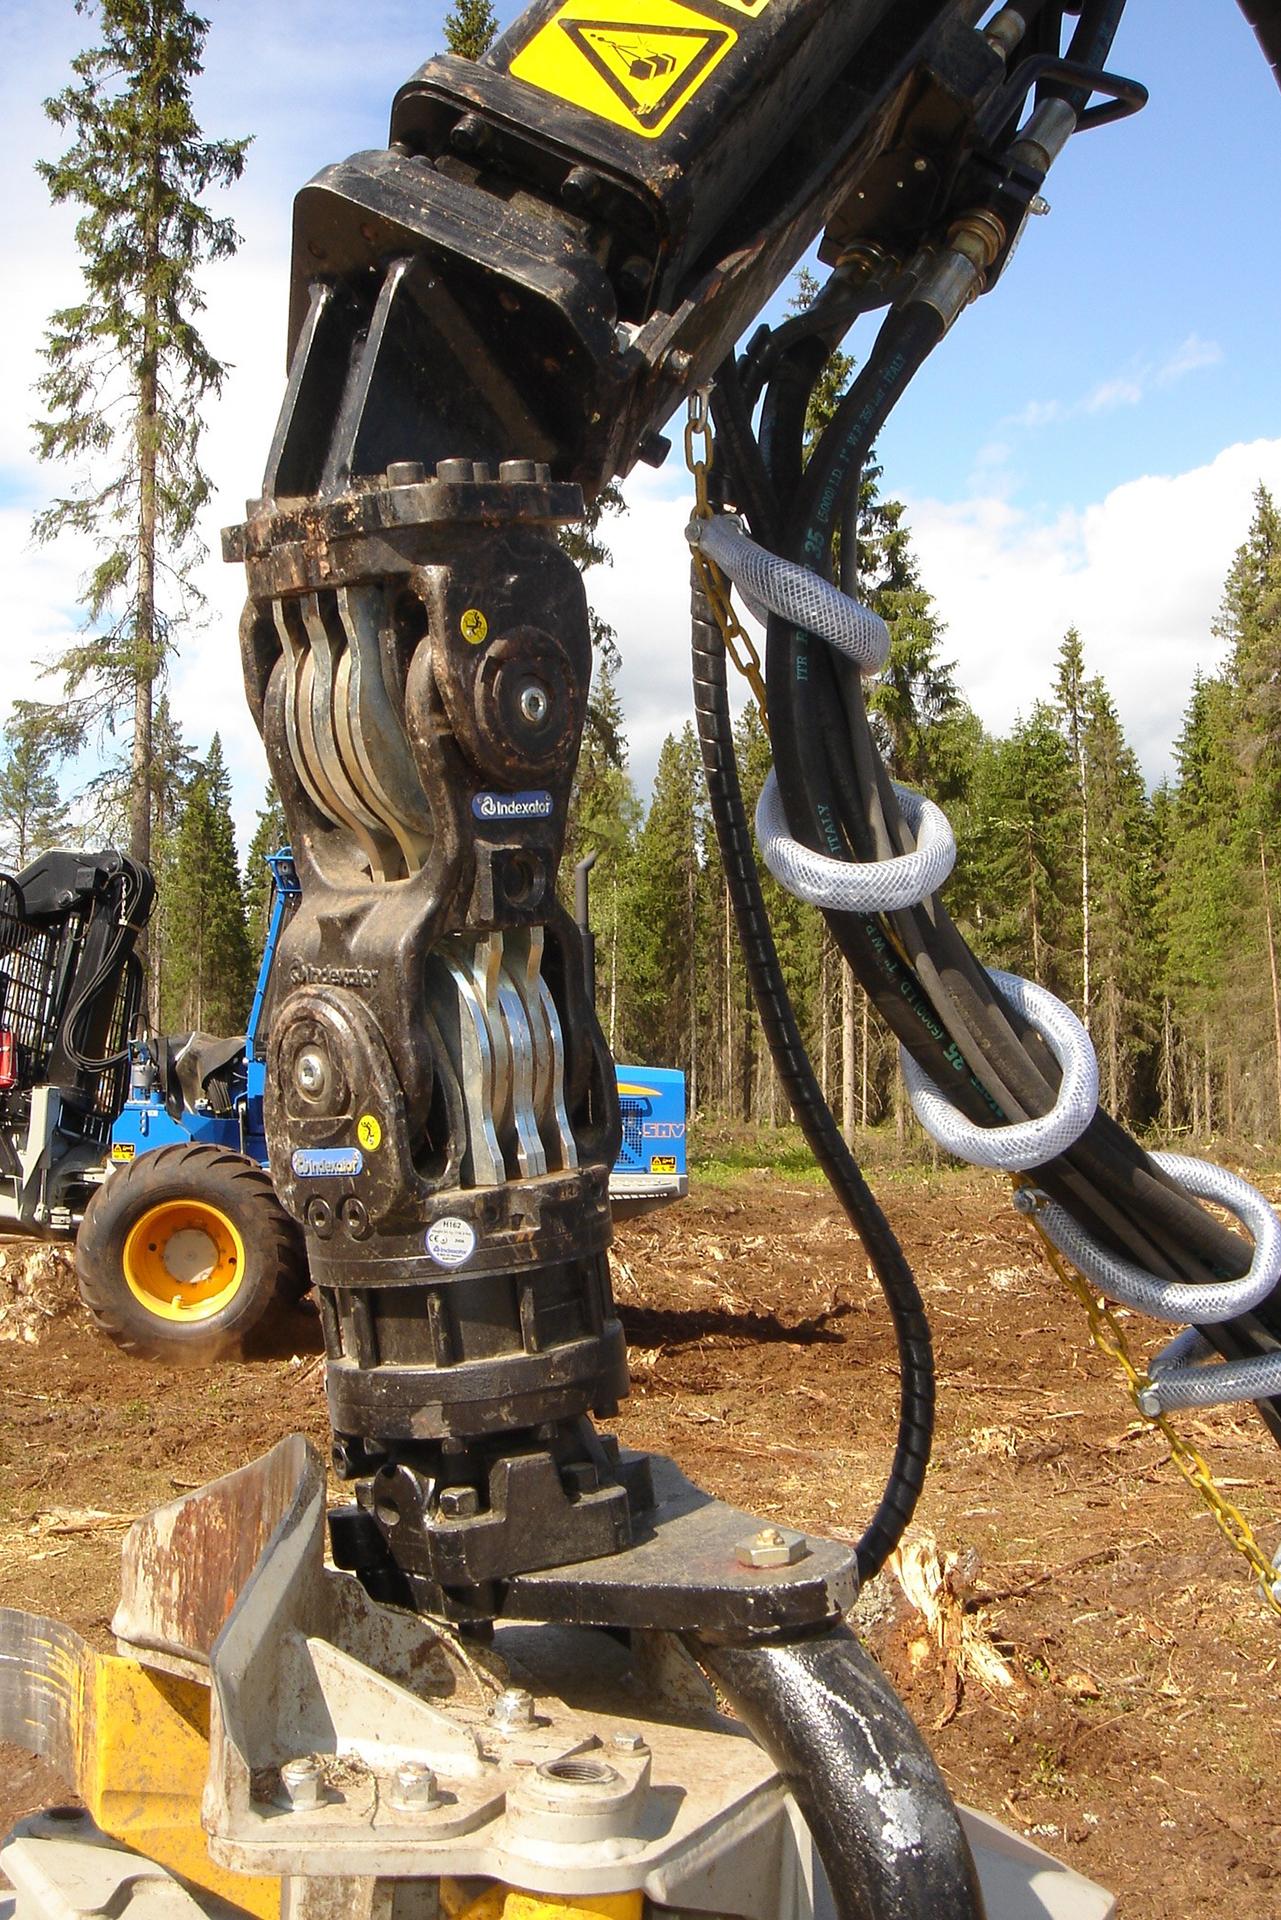 PHILIPP ForstWerkzeuge INDEXATOR Rotator H 152, 10000 Kg statische Last, hydraulischer Rotator, hydraulischer Drehservo, hydraulischer Drehmotor